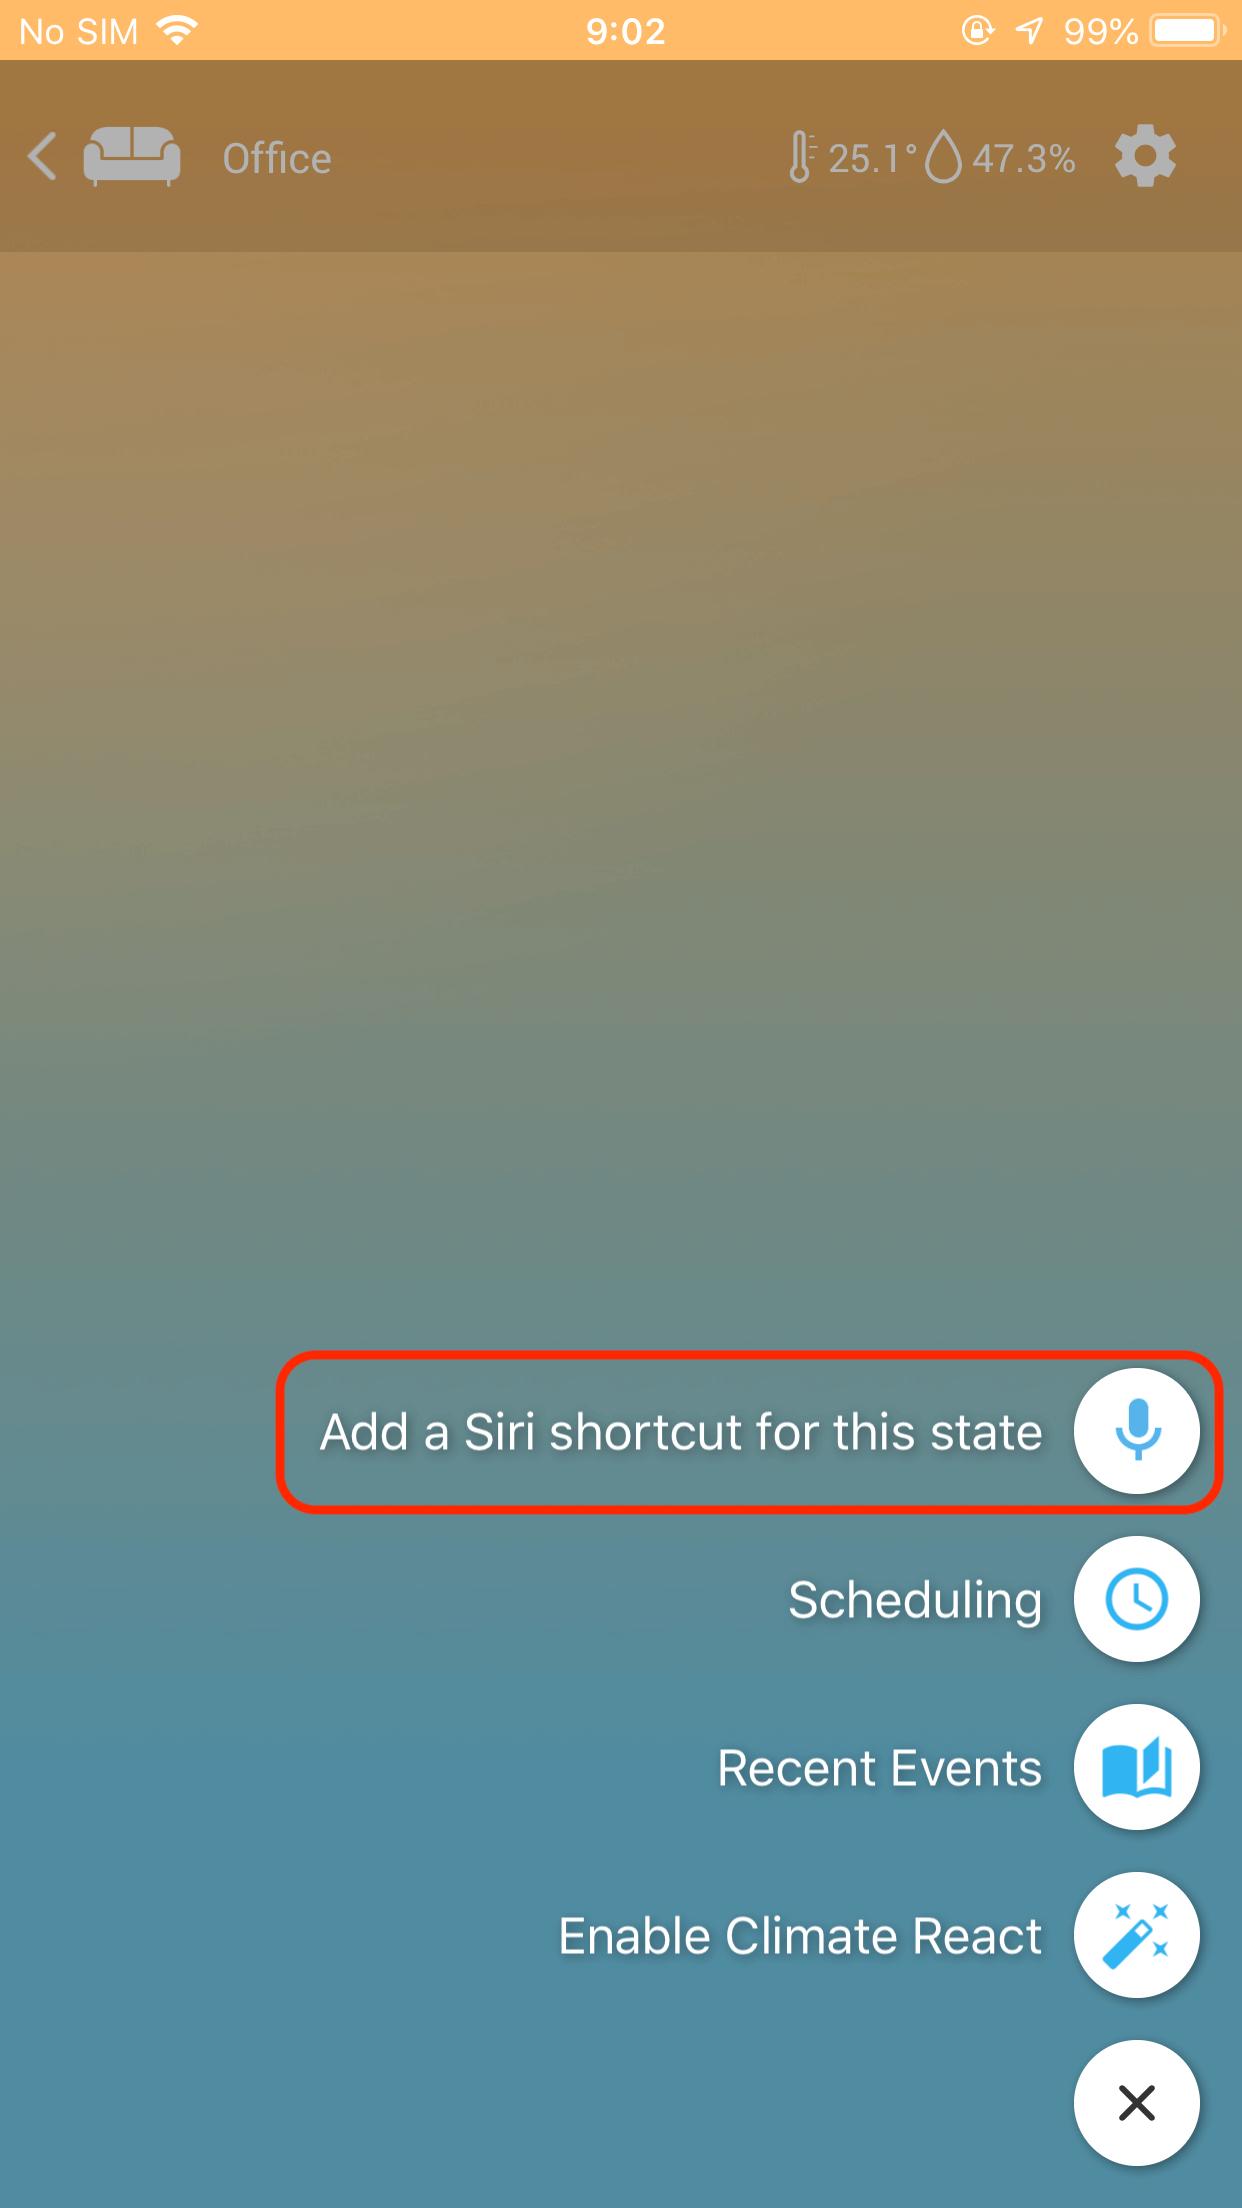 sensibo add siri shortcut for this state